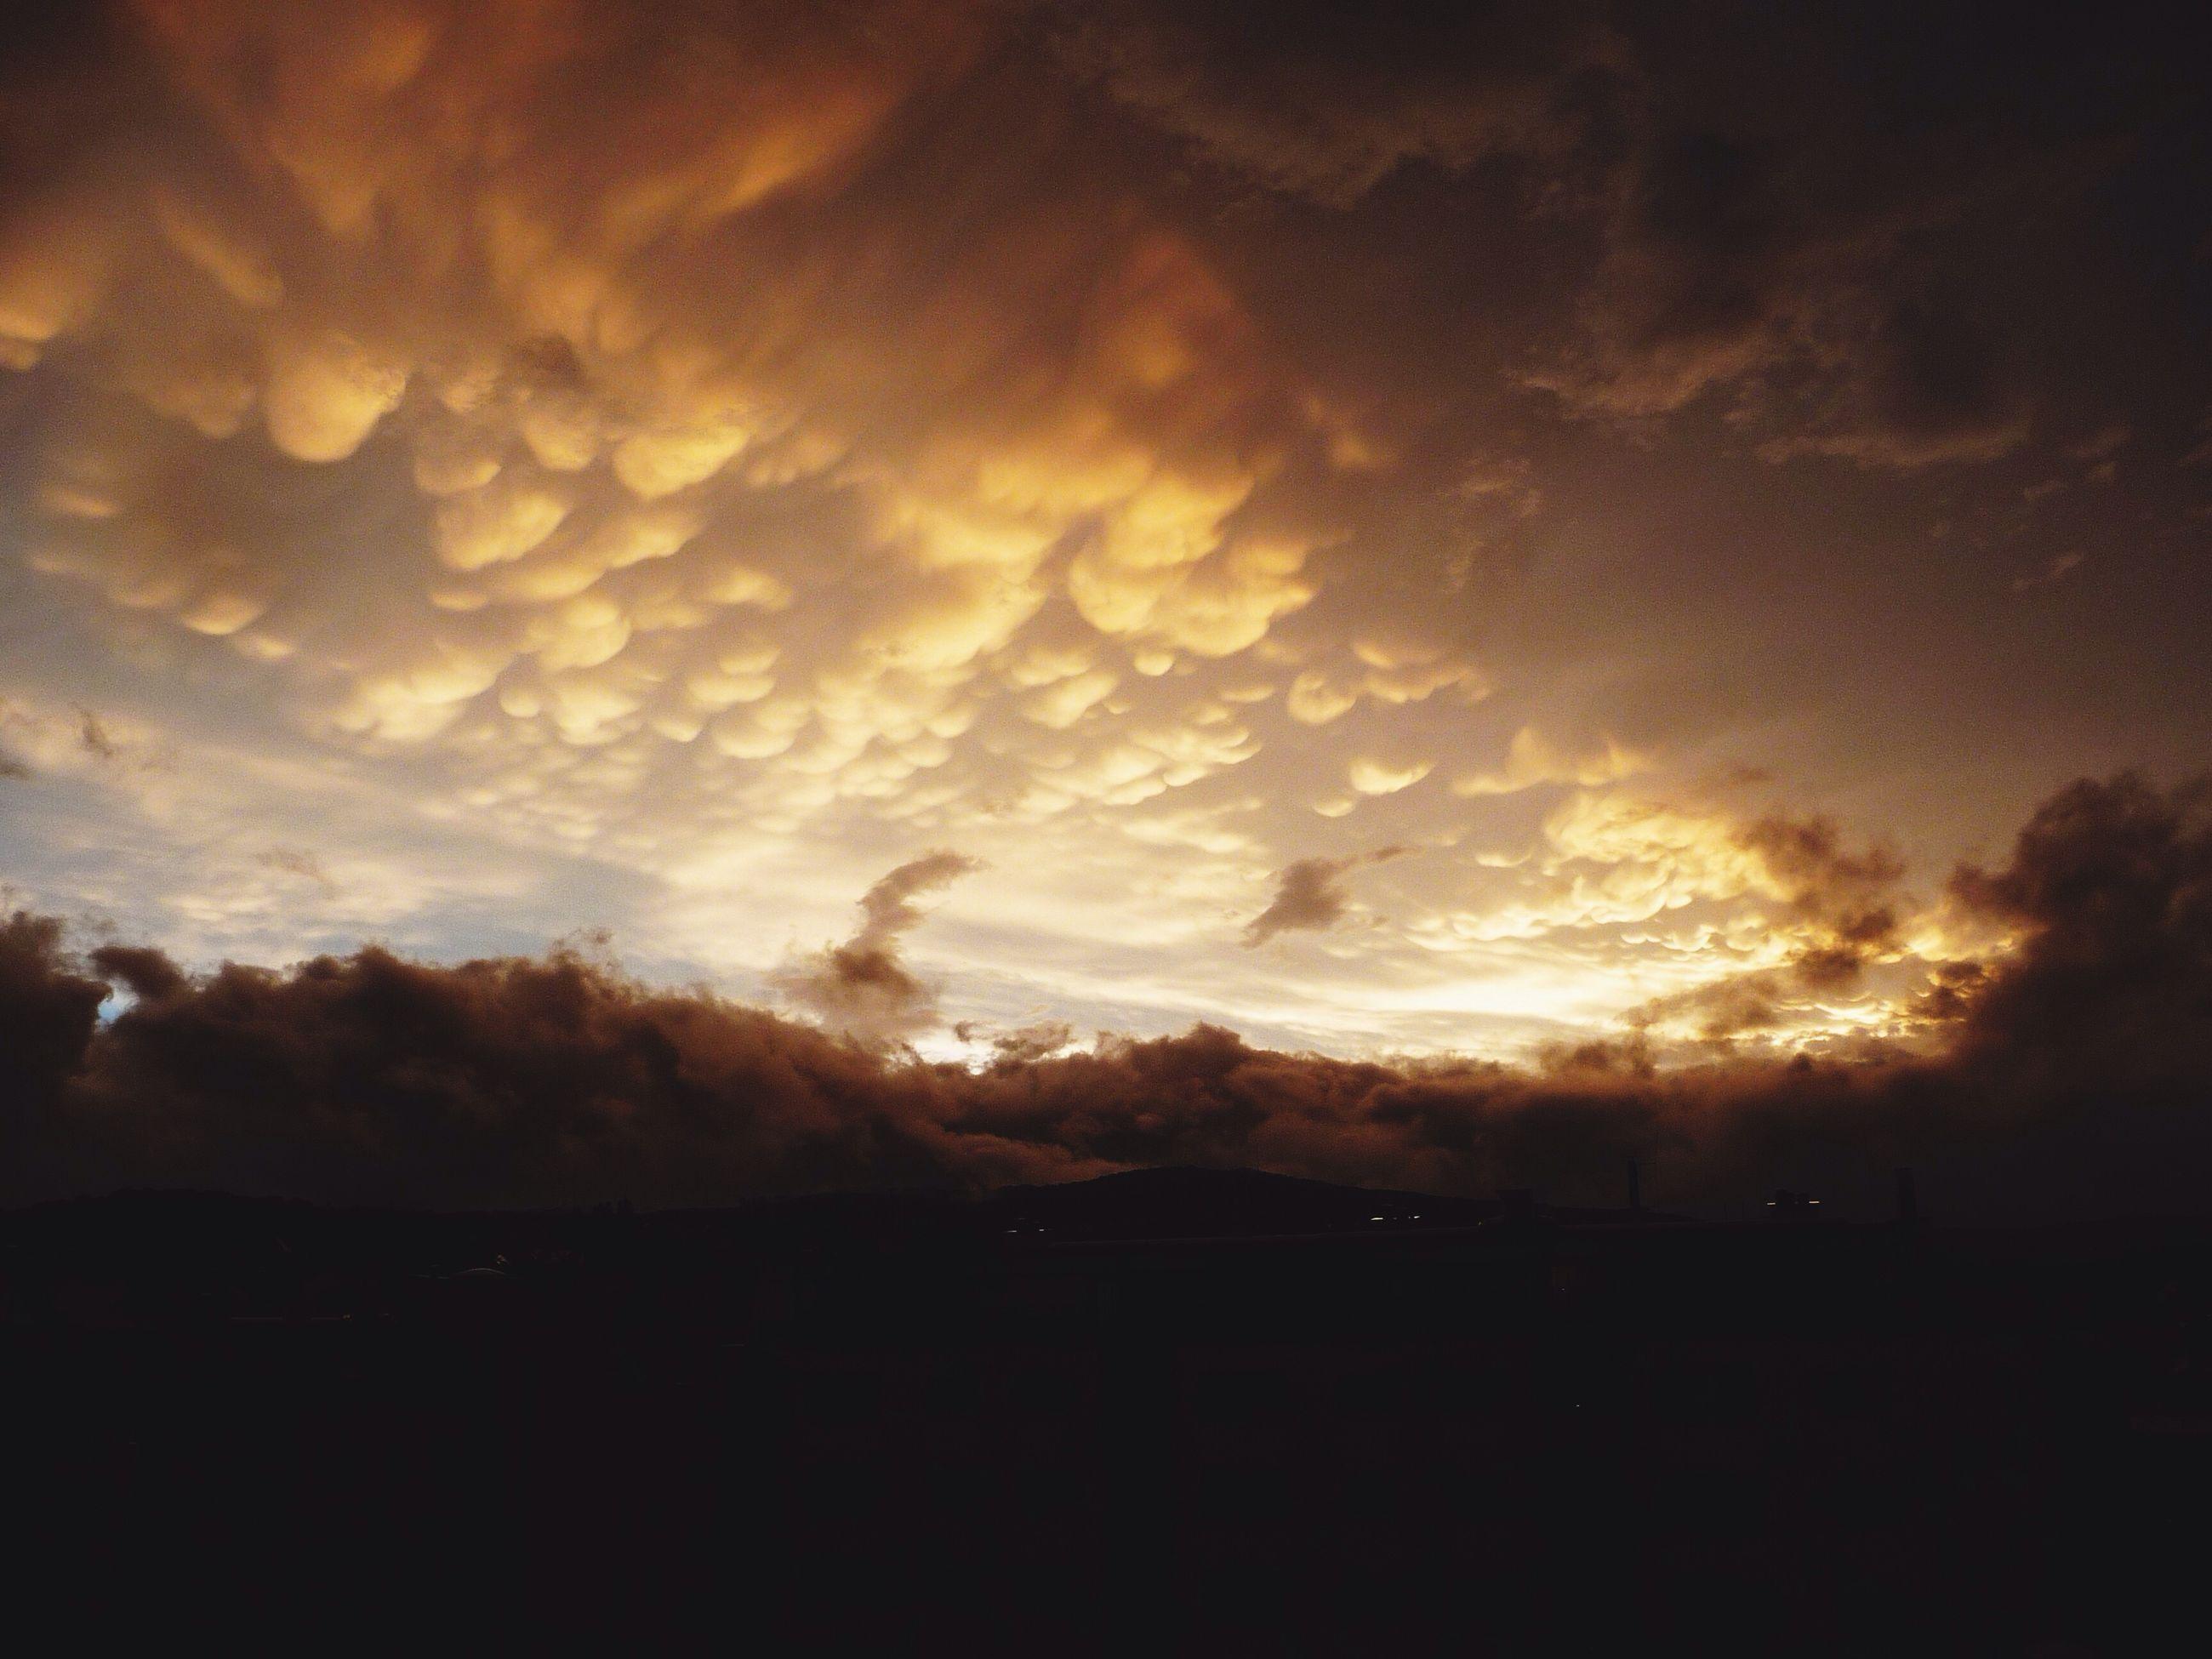 sunset, silhouette, sky, scenics, cloud - sky, beauty in nature, tranquil scene, tranquility, orange color, nature, dark, idyllic, dramatic sky, landscape, cloud, outdoors, sun, dusk, cloudy, no people